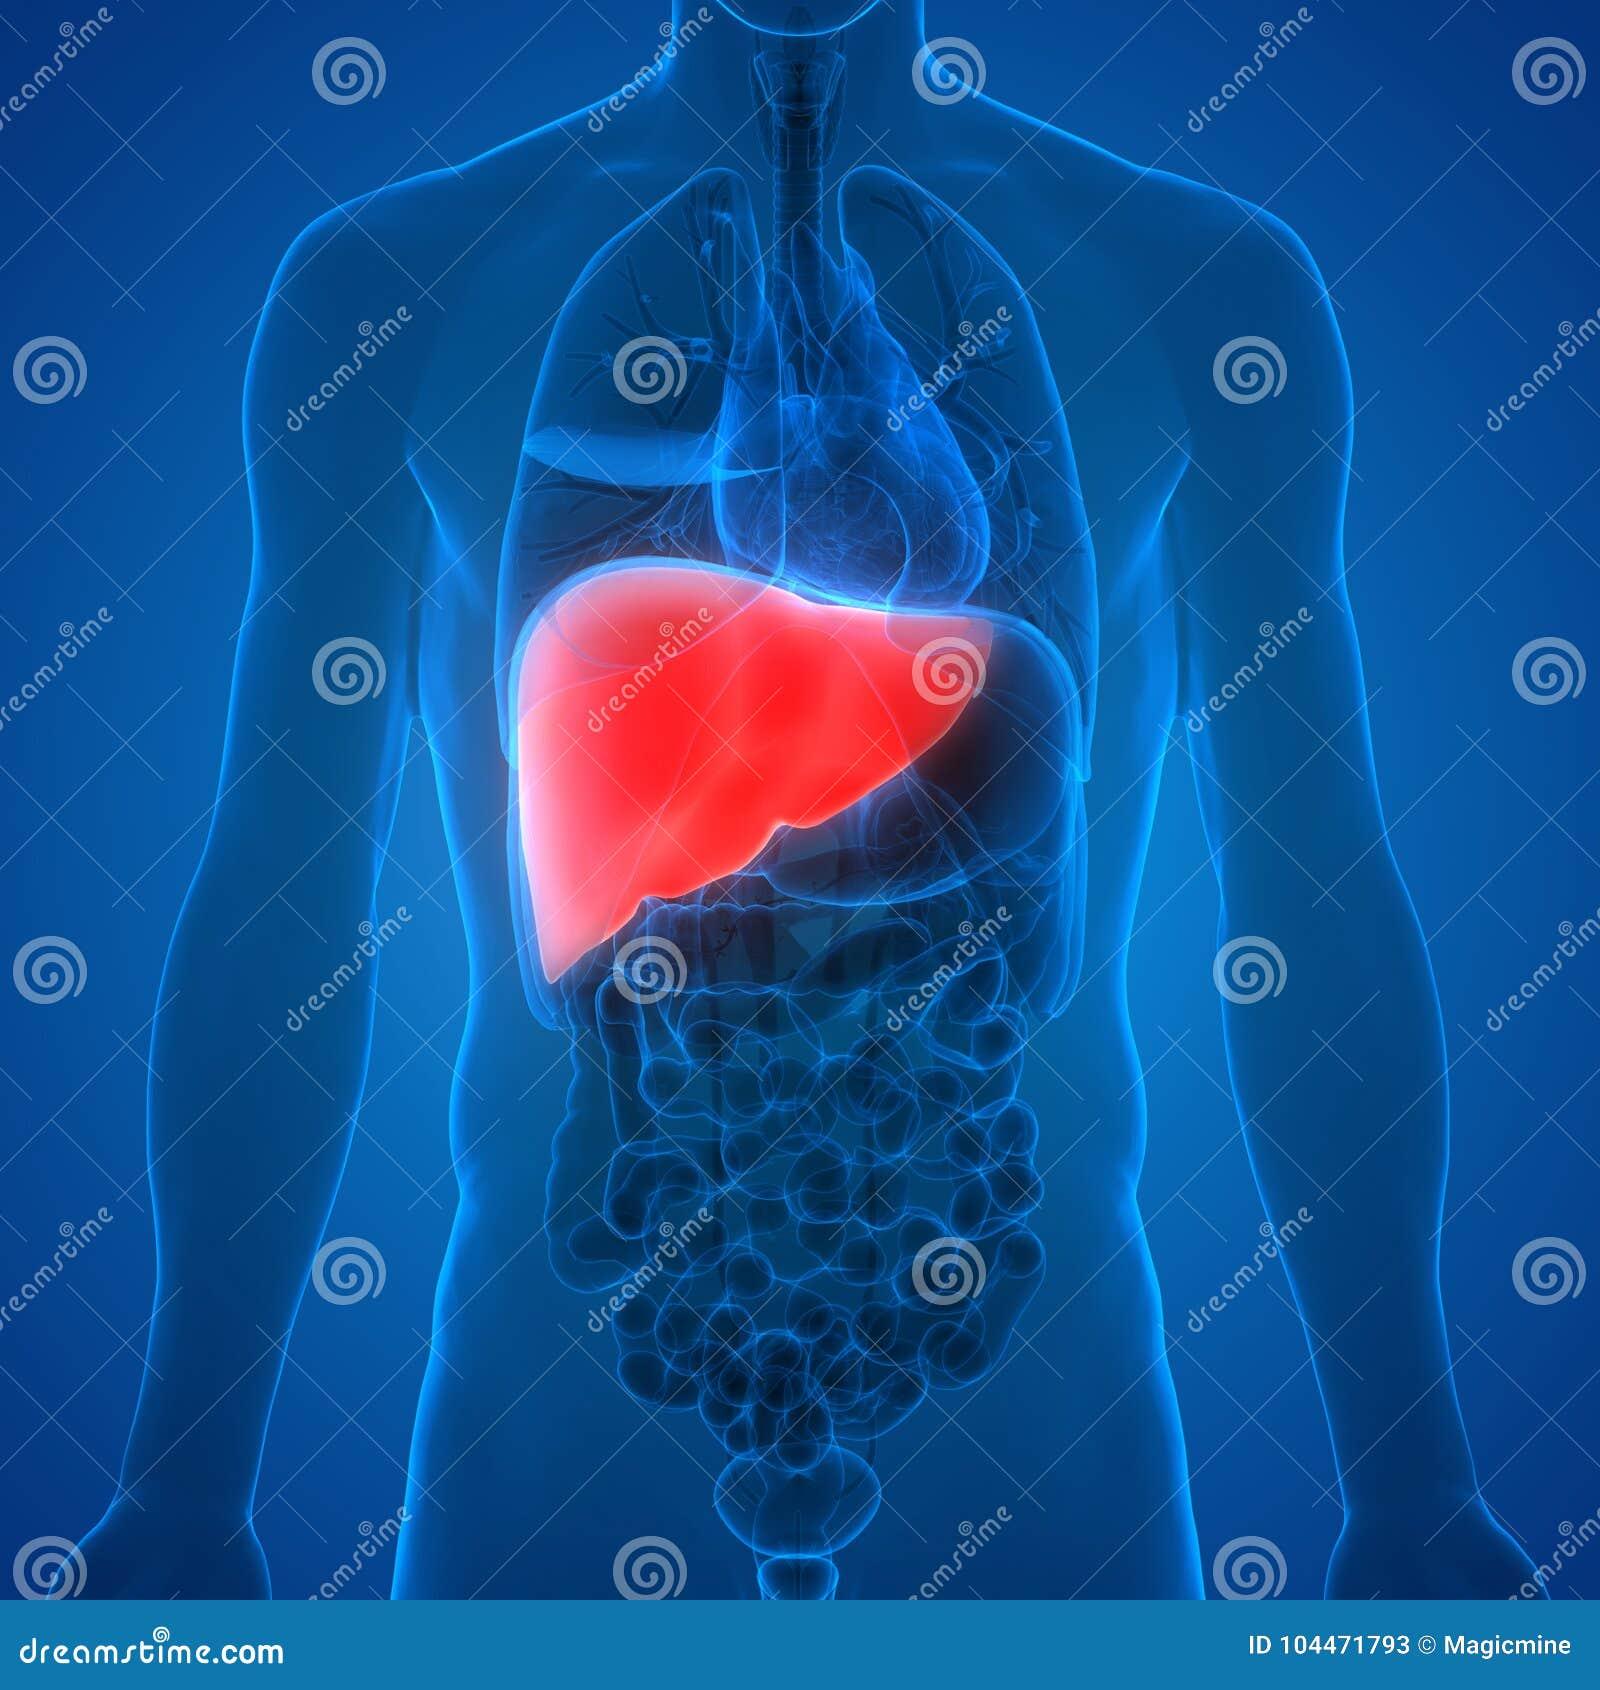 Human Body Internal Organs Liver Anatomy Stock Illustration